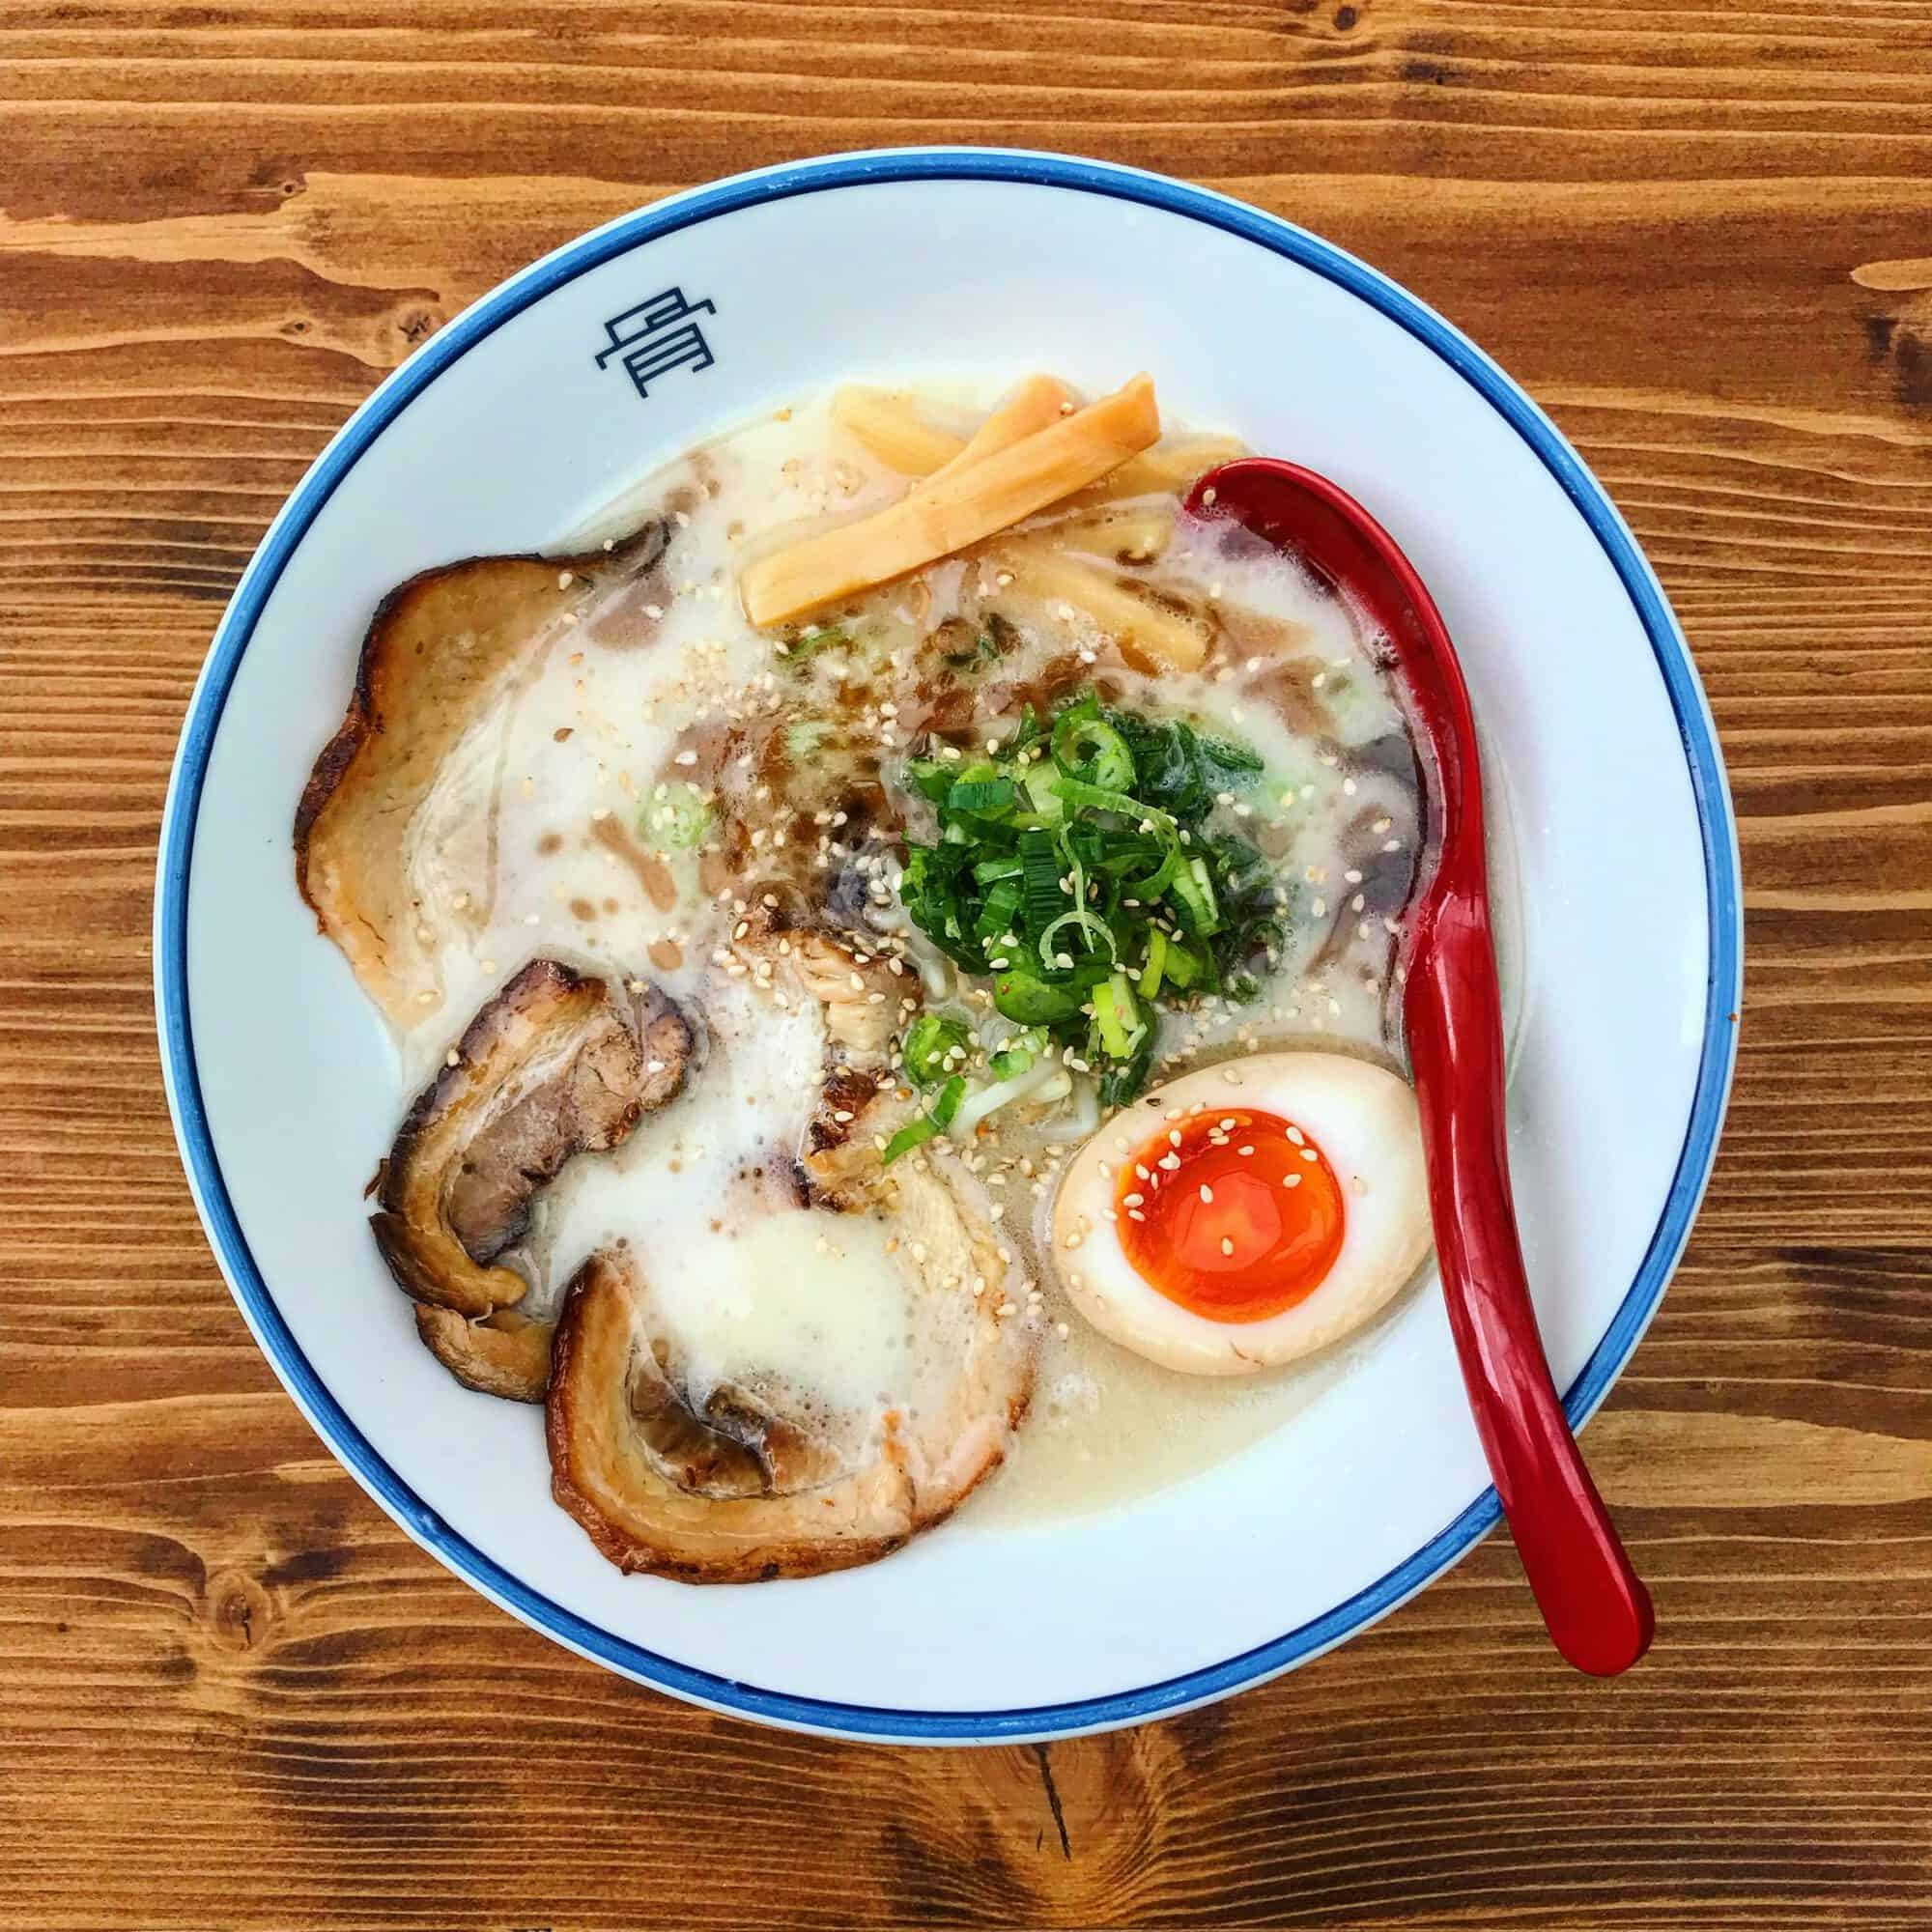 Tonkotsu new restaurant